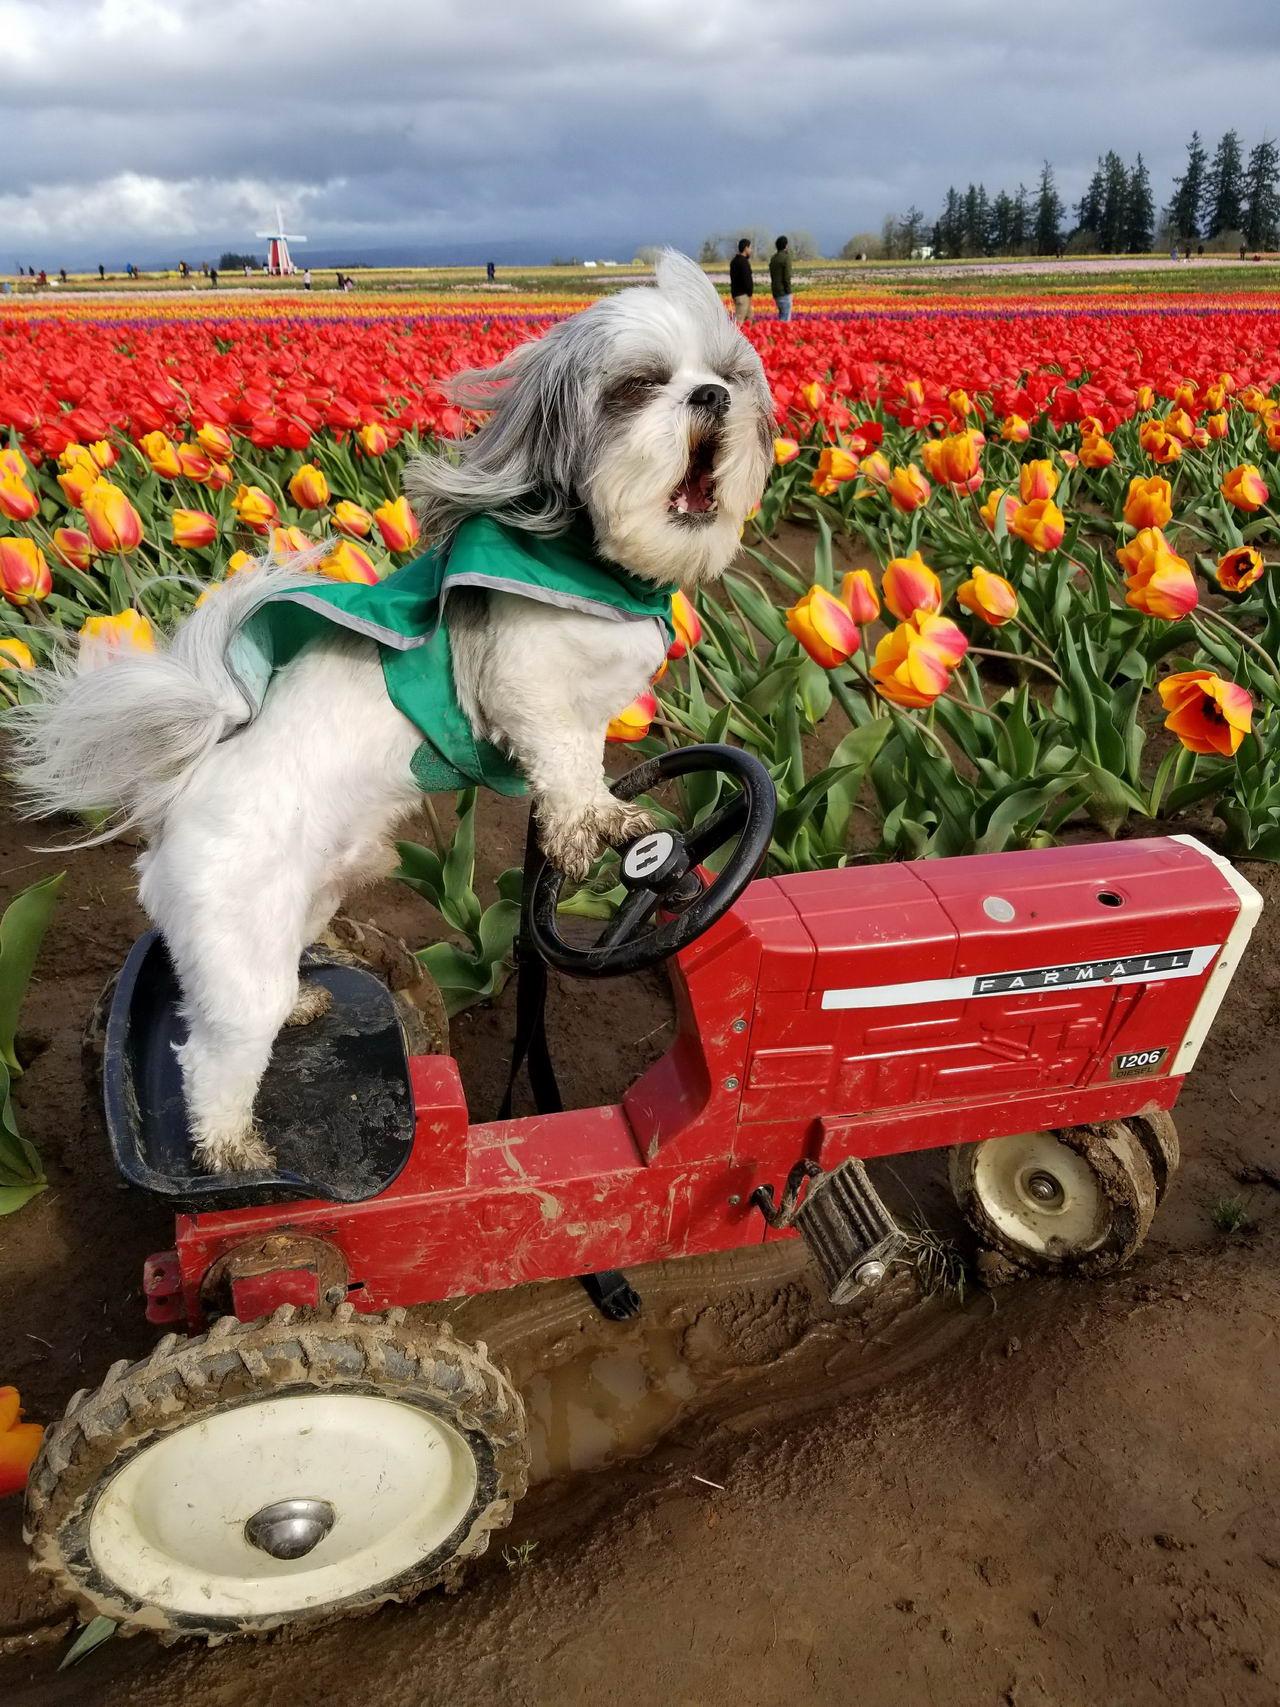 Забавные Животные - Pixmafia Funny Animals - 045 (40 фото)